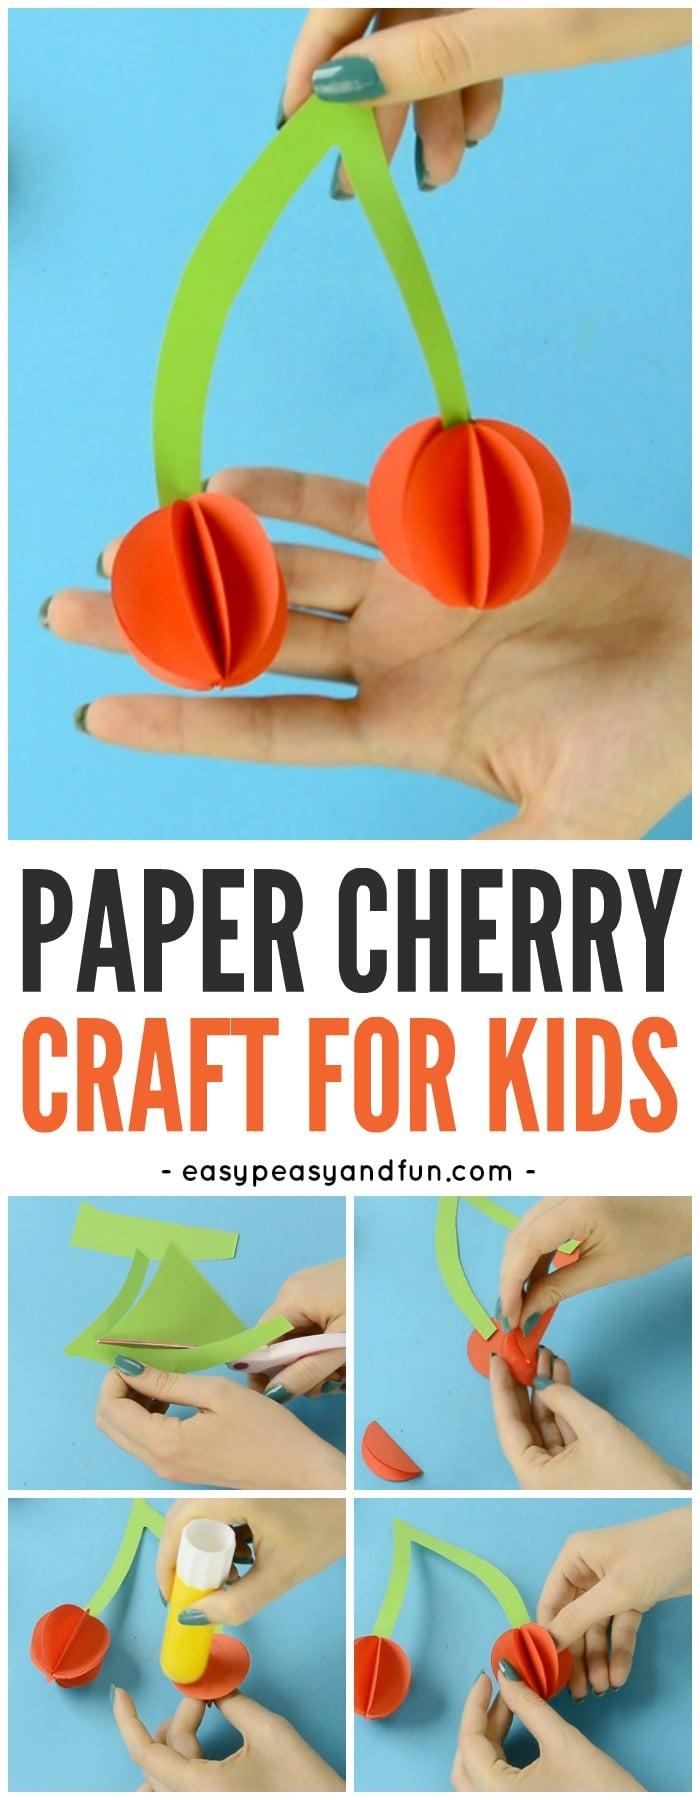 Fun Paper Cherry Craft for Kids